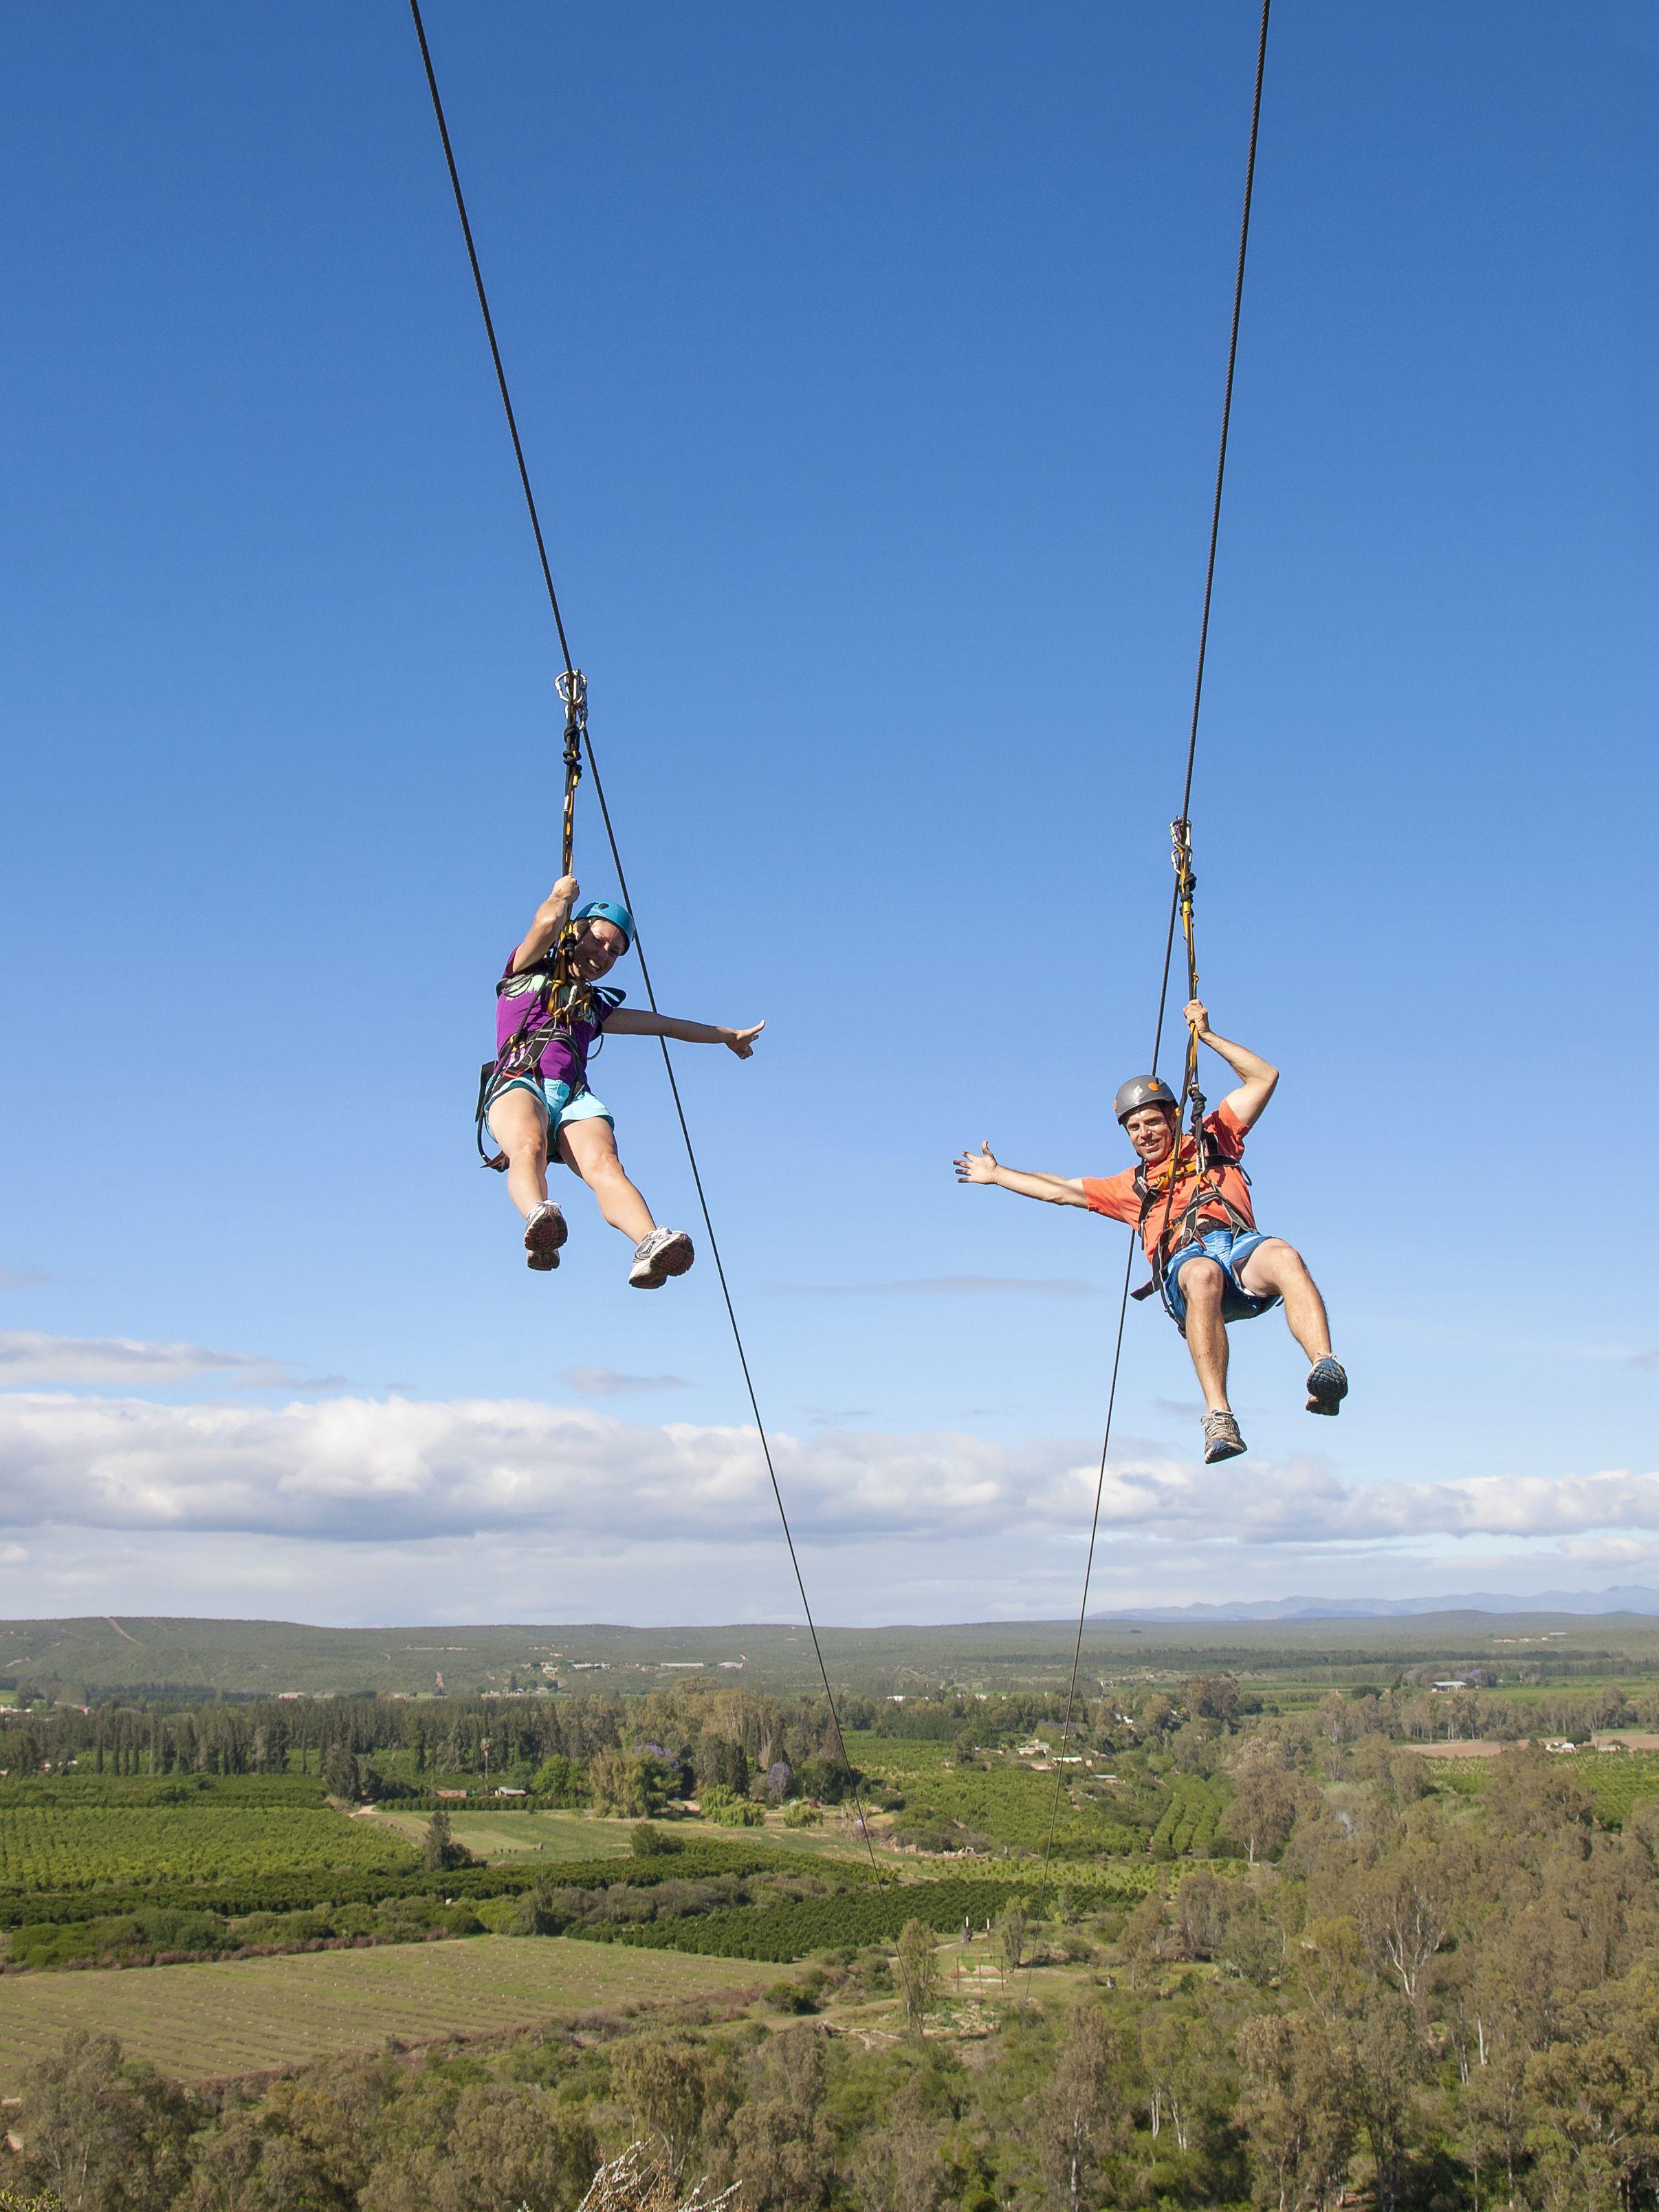 Zip Line With Adrenalin Addo South Africa Ziplining South African Adventures Port Elizabeth